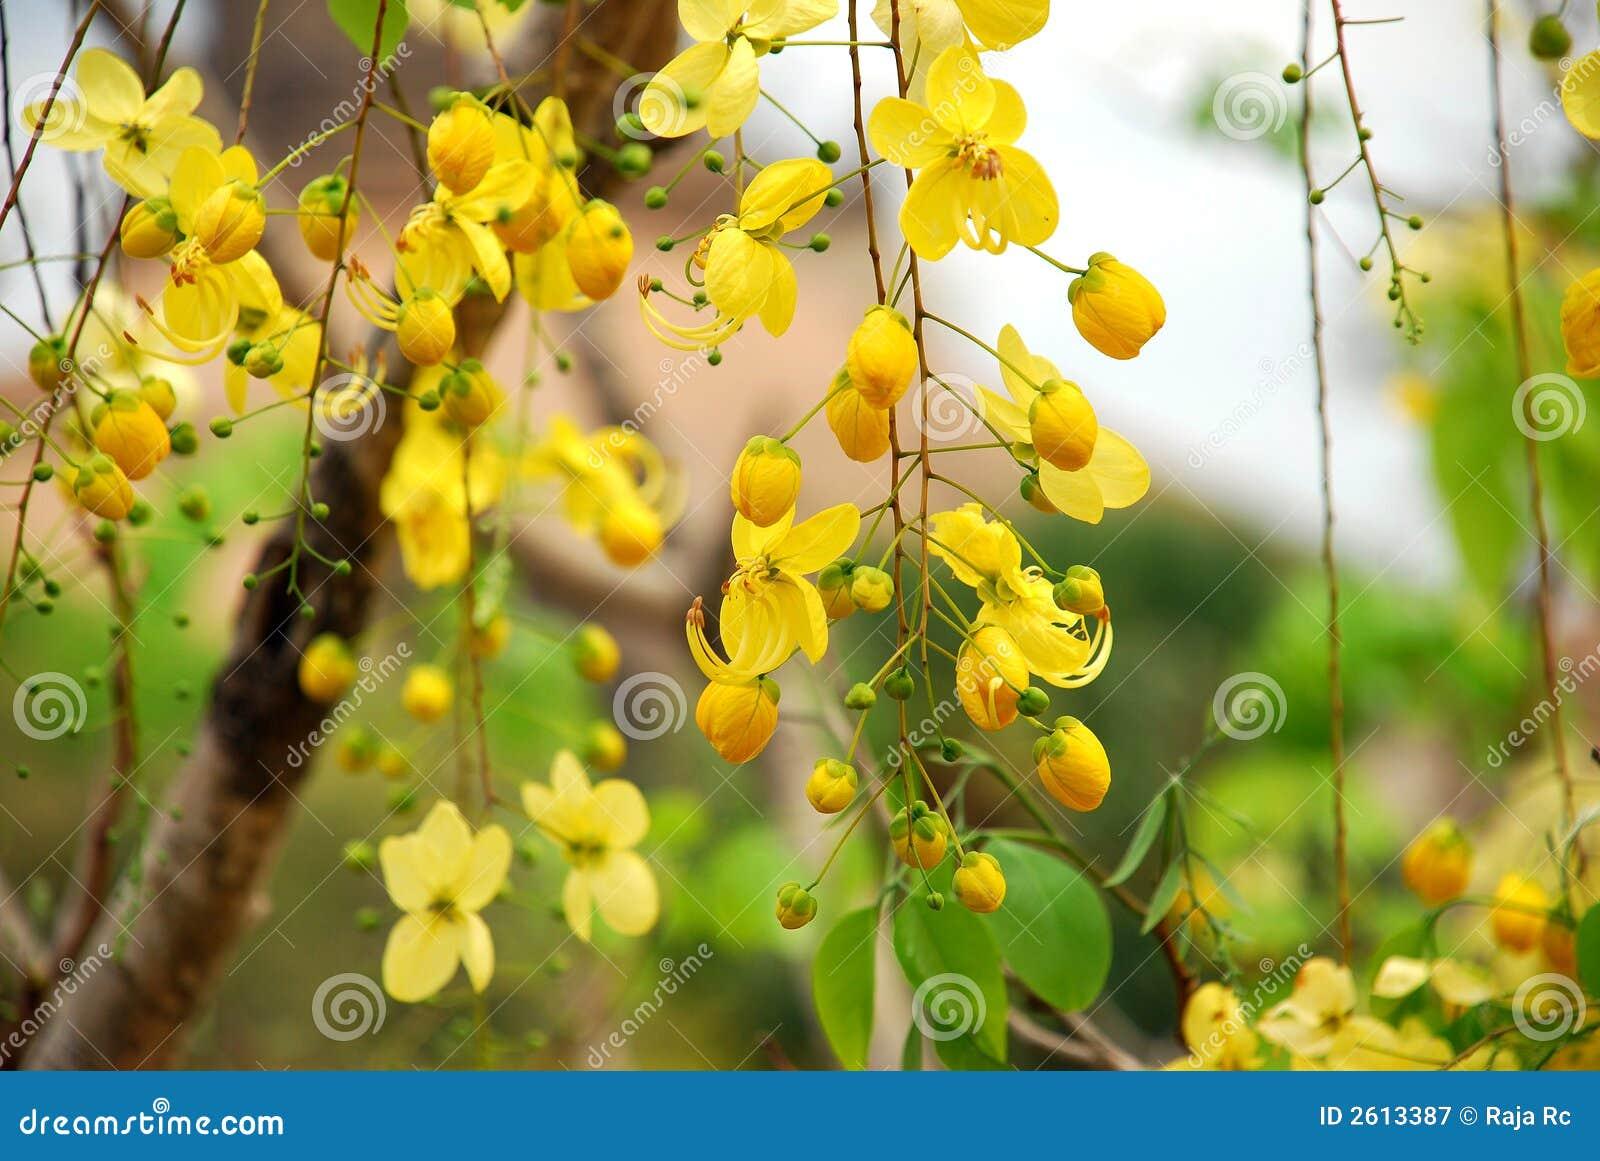 Yellow flowers tree stock image image of color tree 2613387 mightylinksfo